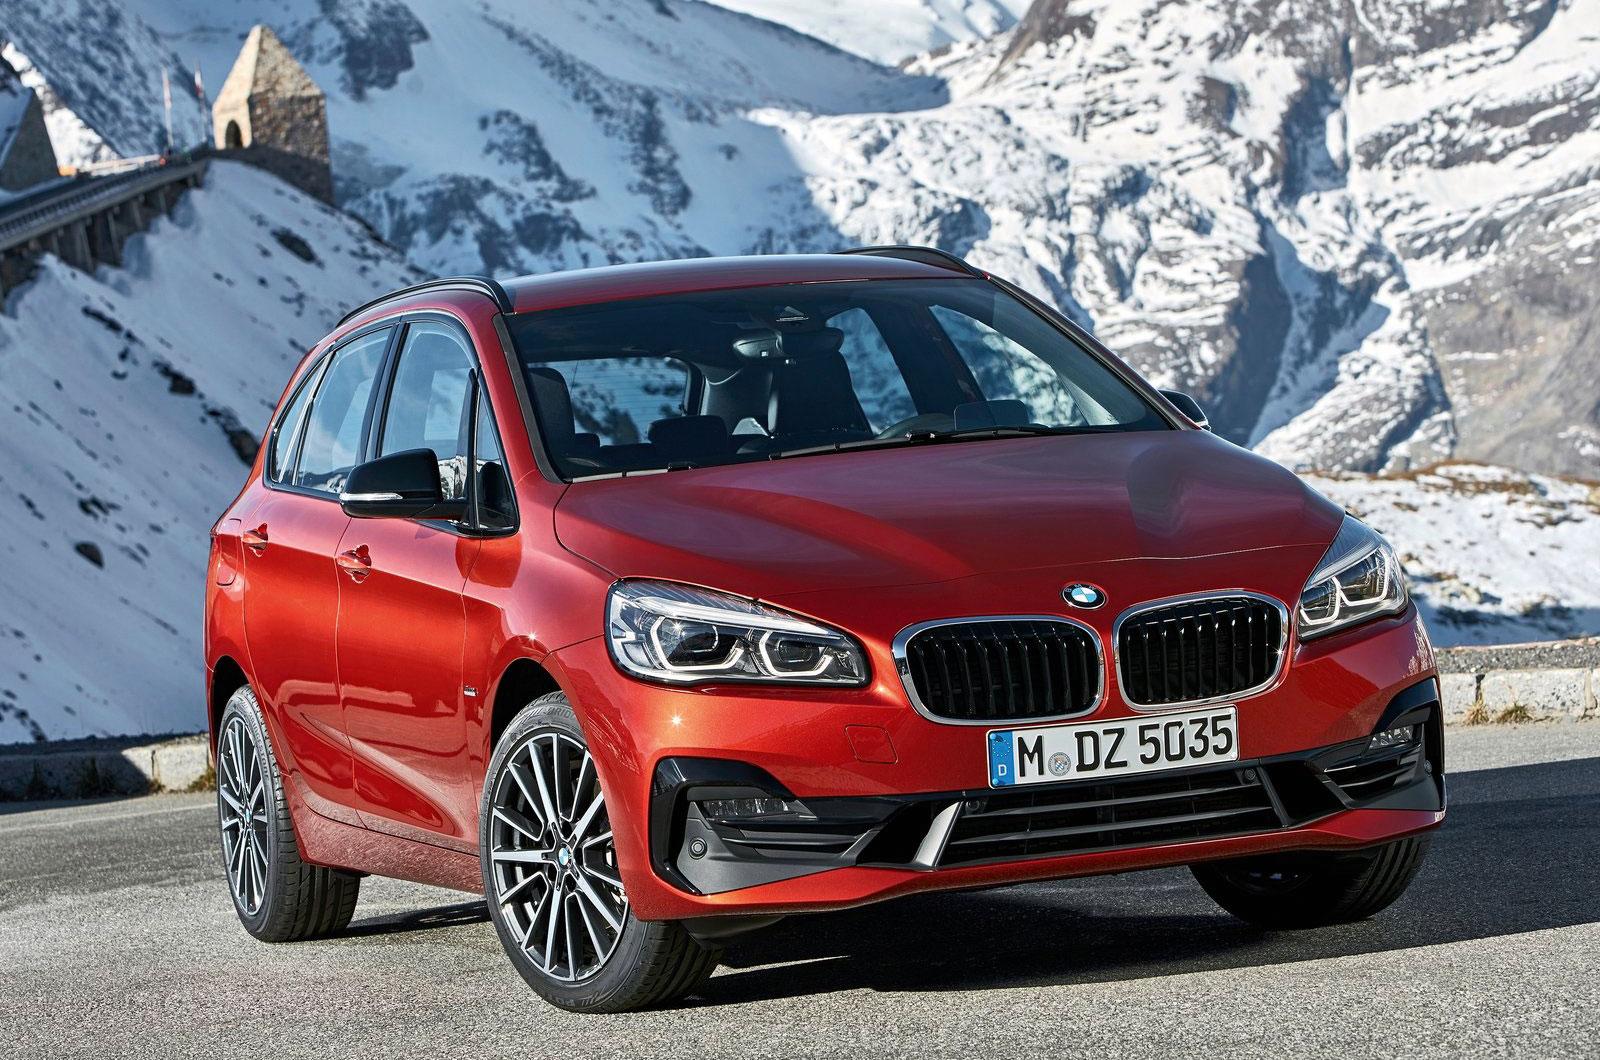 Top 2019 BMW 1 Series model to be 300bhp M130iX M Performance   Autocar